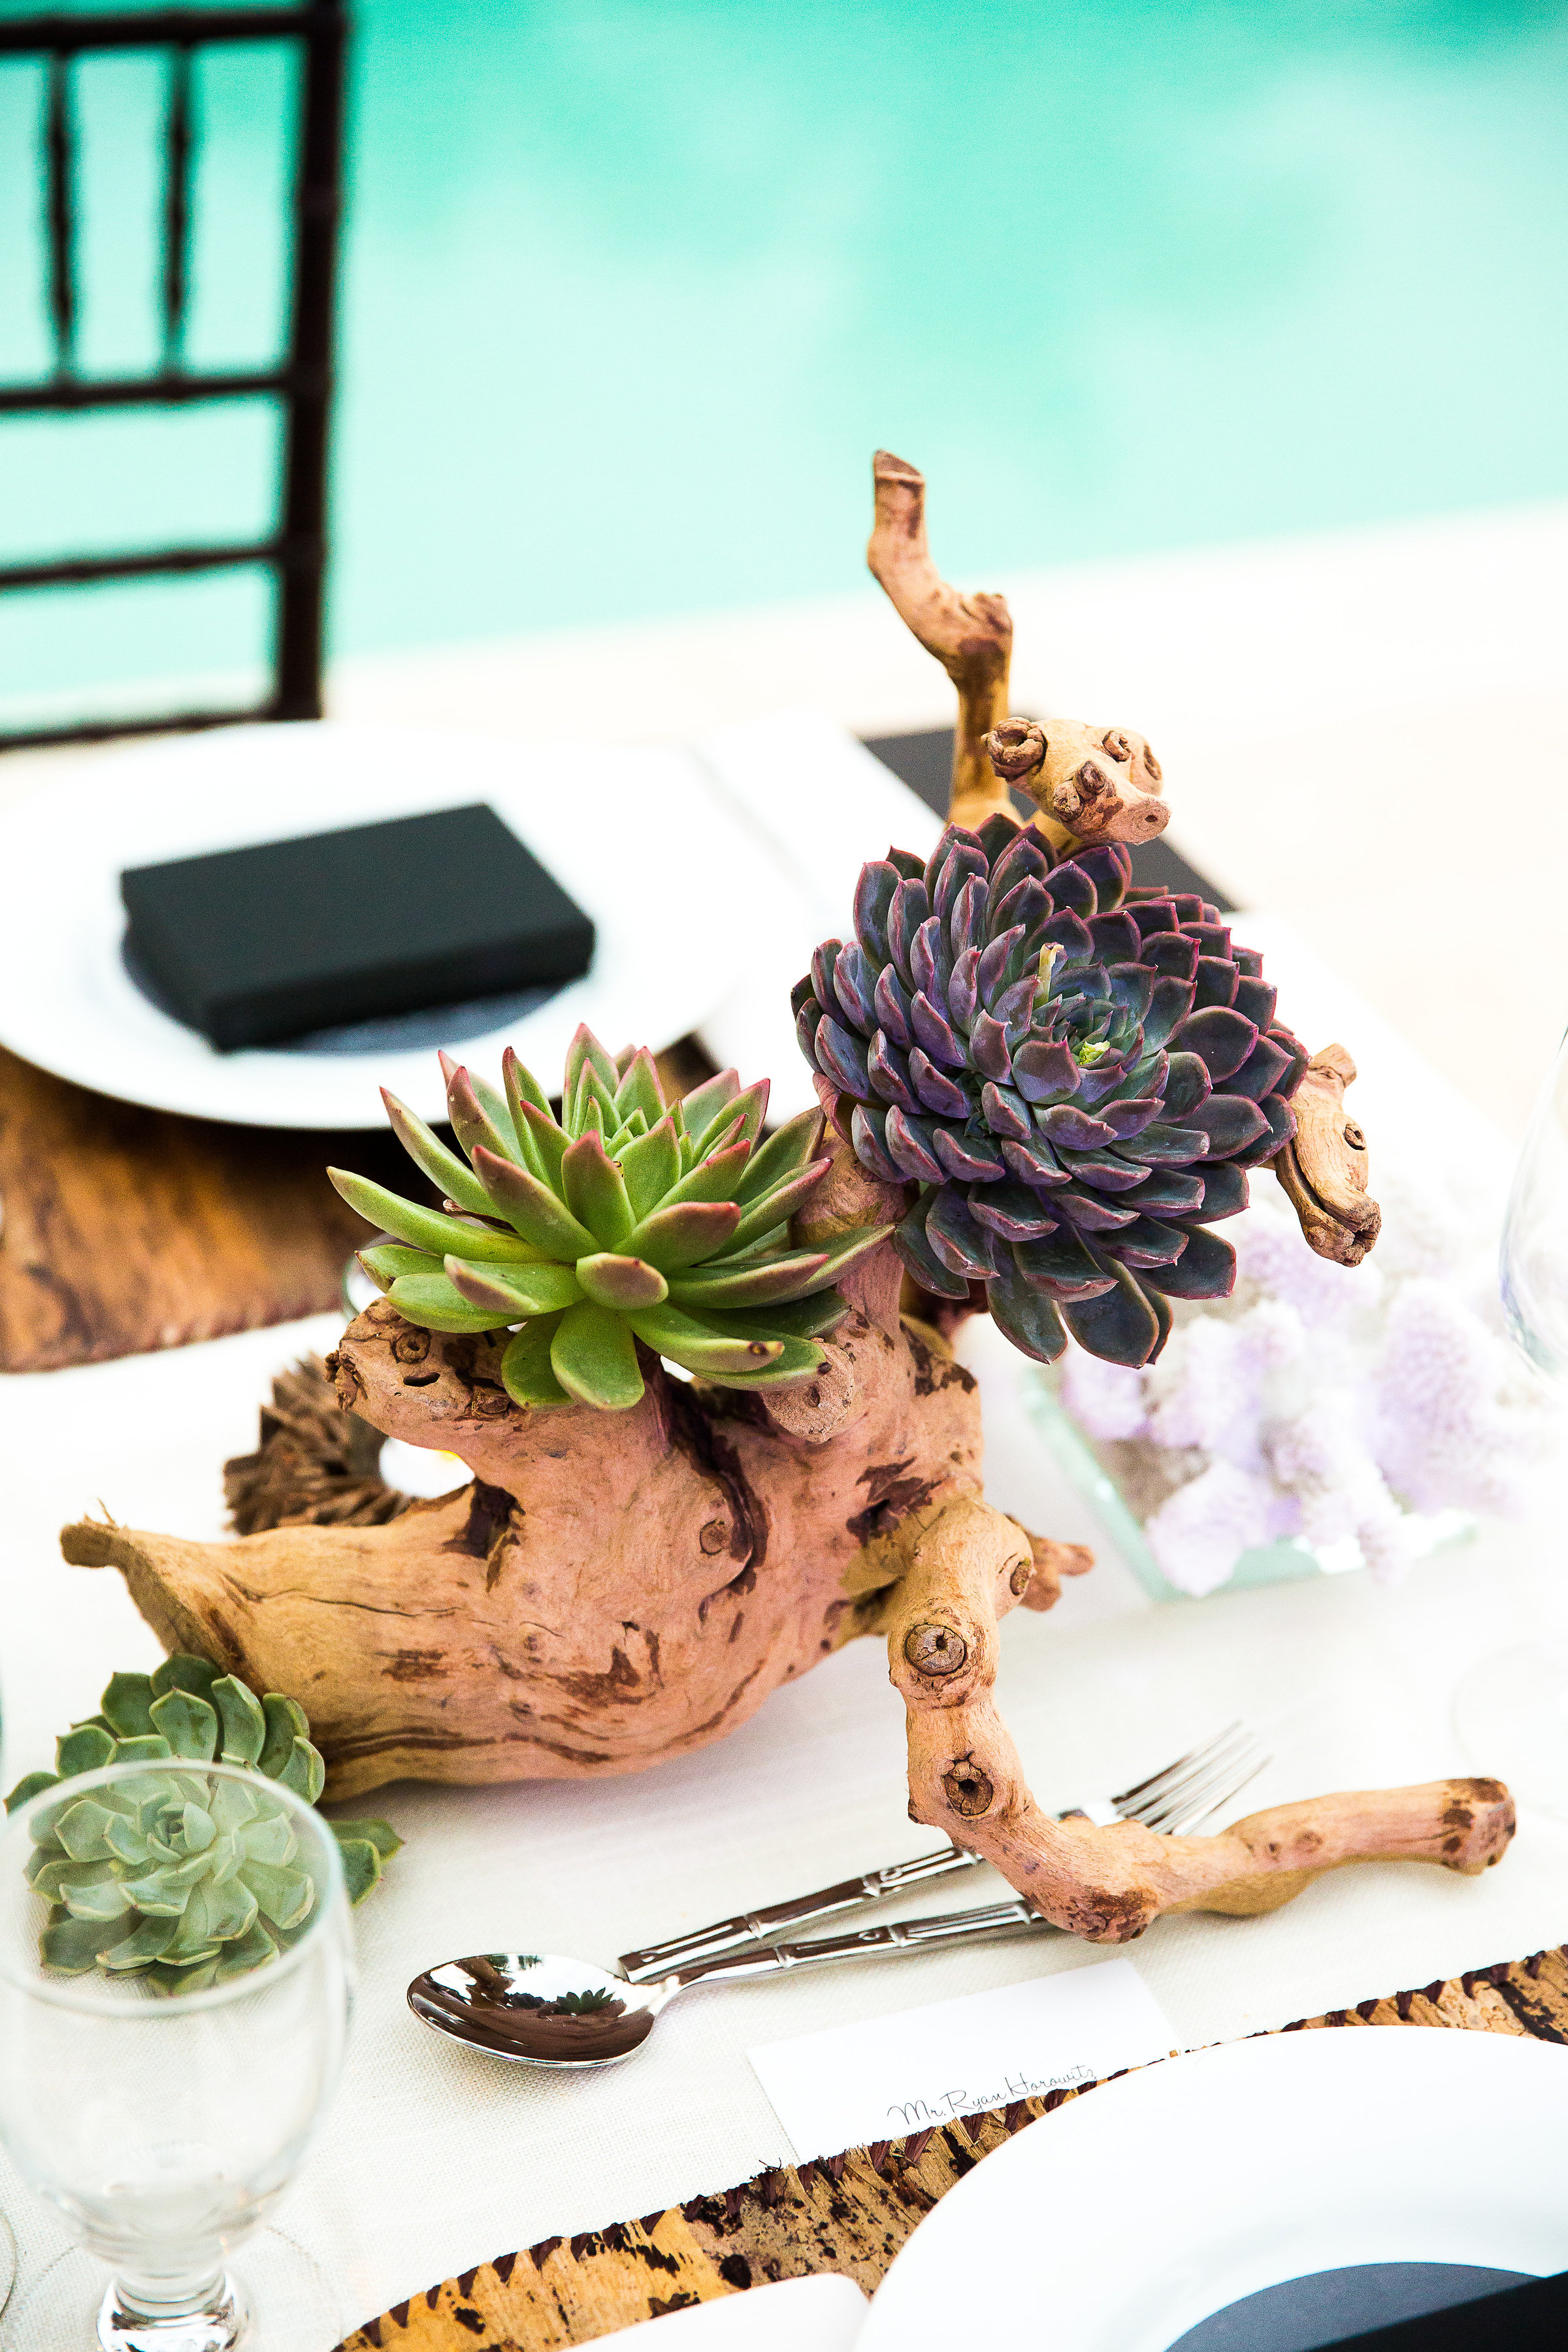 Ceci_New_York_Ceci_Style_Ceci_Johnson_Luxury_Lifestyle_Destination_Bahamas_Wedding_Letterpress_Inspiration_Design_Custom_Couture_Personalized_Invitations_12.jpg